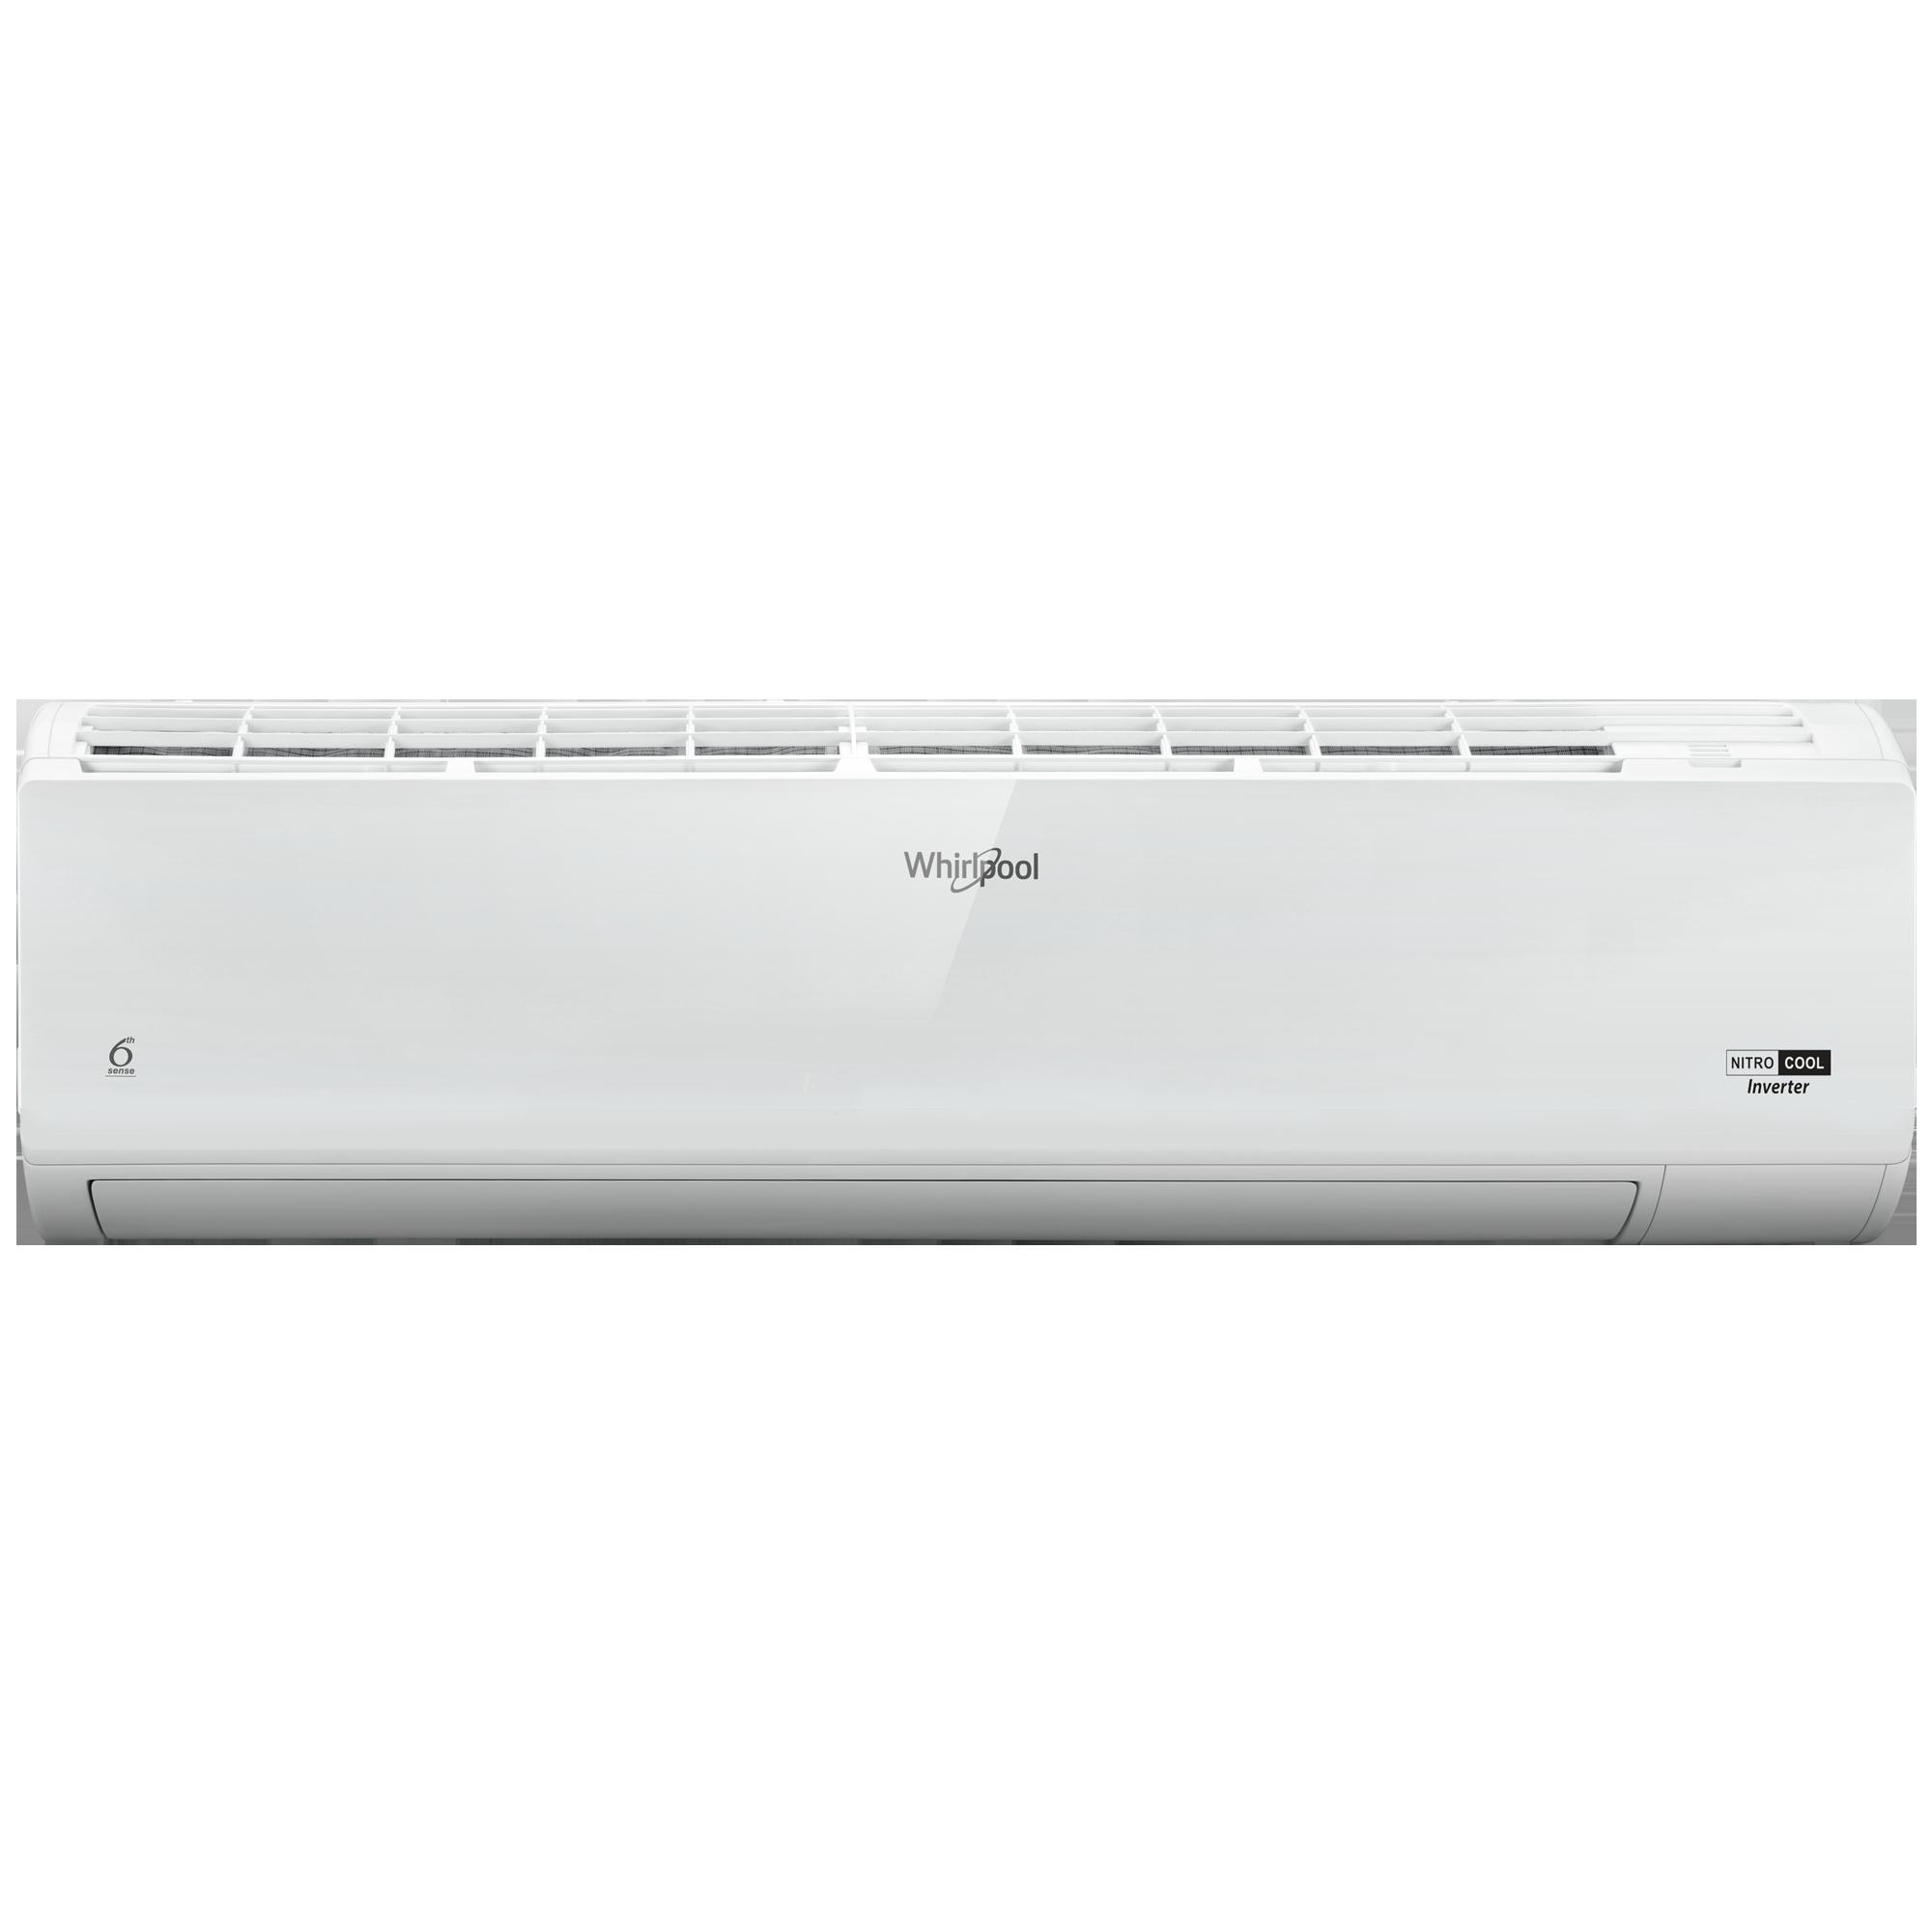 Whirlpool Nitrocool 1 Ton 3 Star Inverter Split AC (4-in-1 Convertible, Copper Condenser, SAI12B31N0D, White)_1